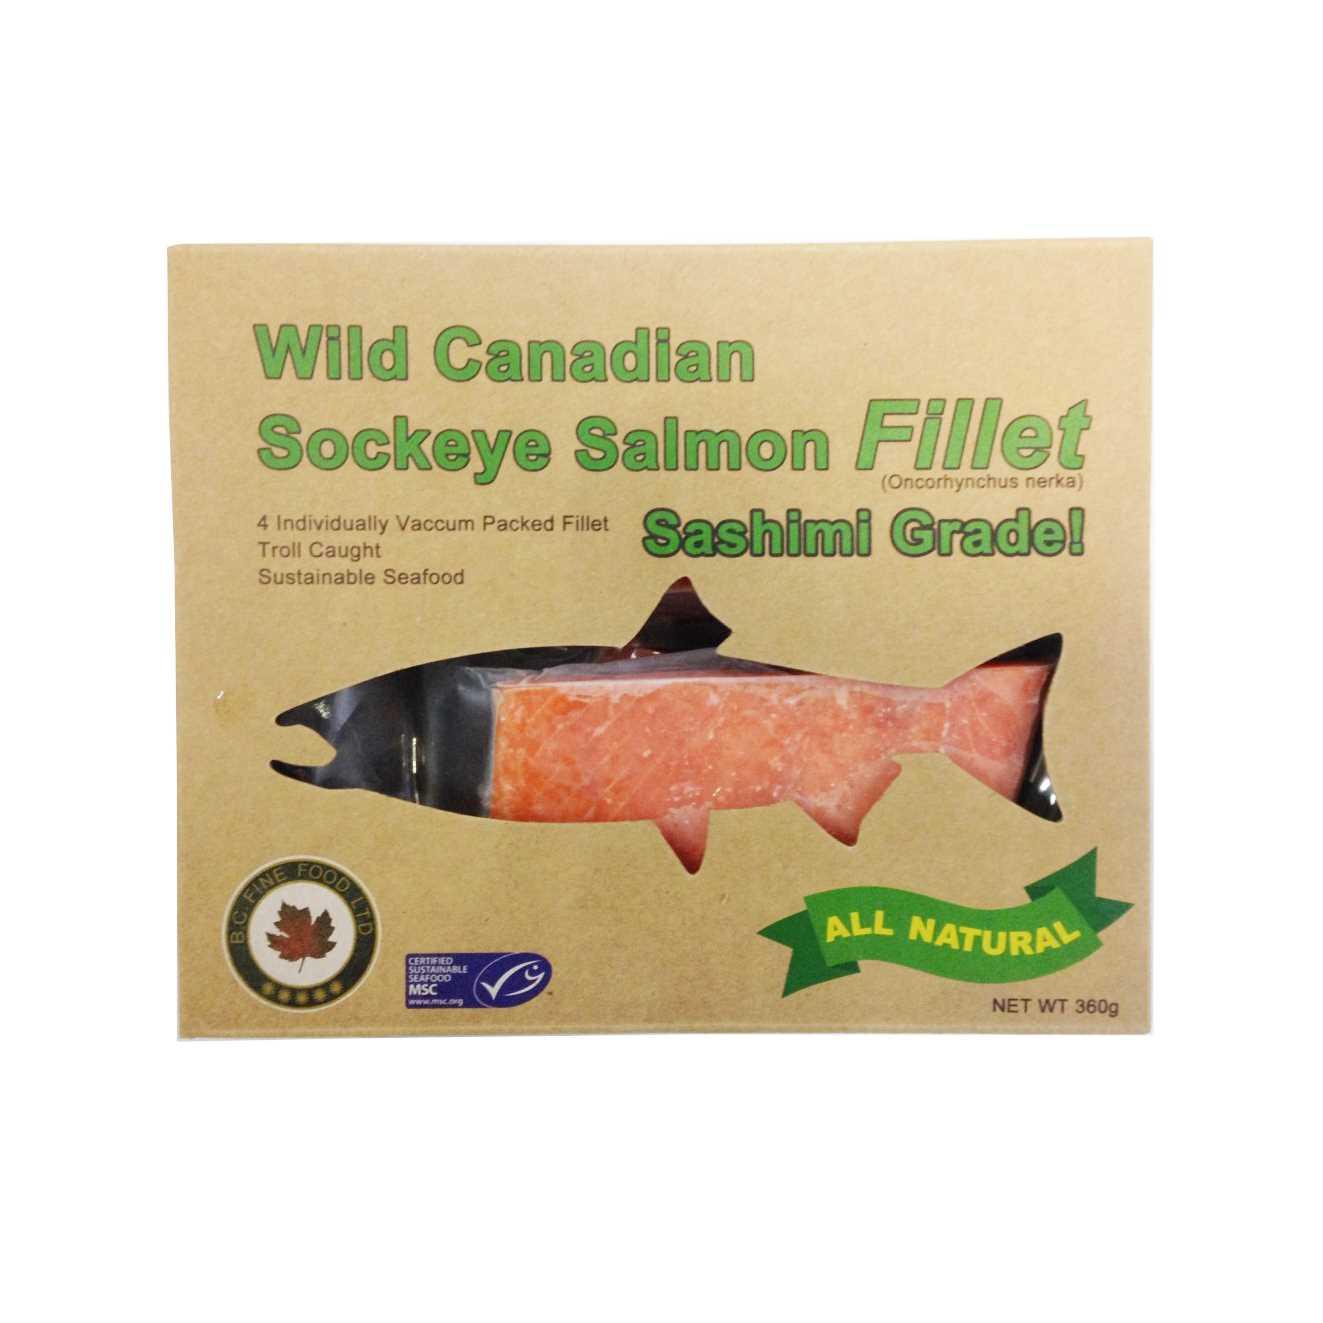 Wild Canadian 加拿大天然野生三文魚